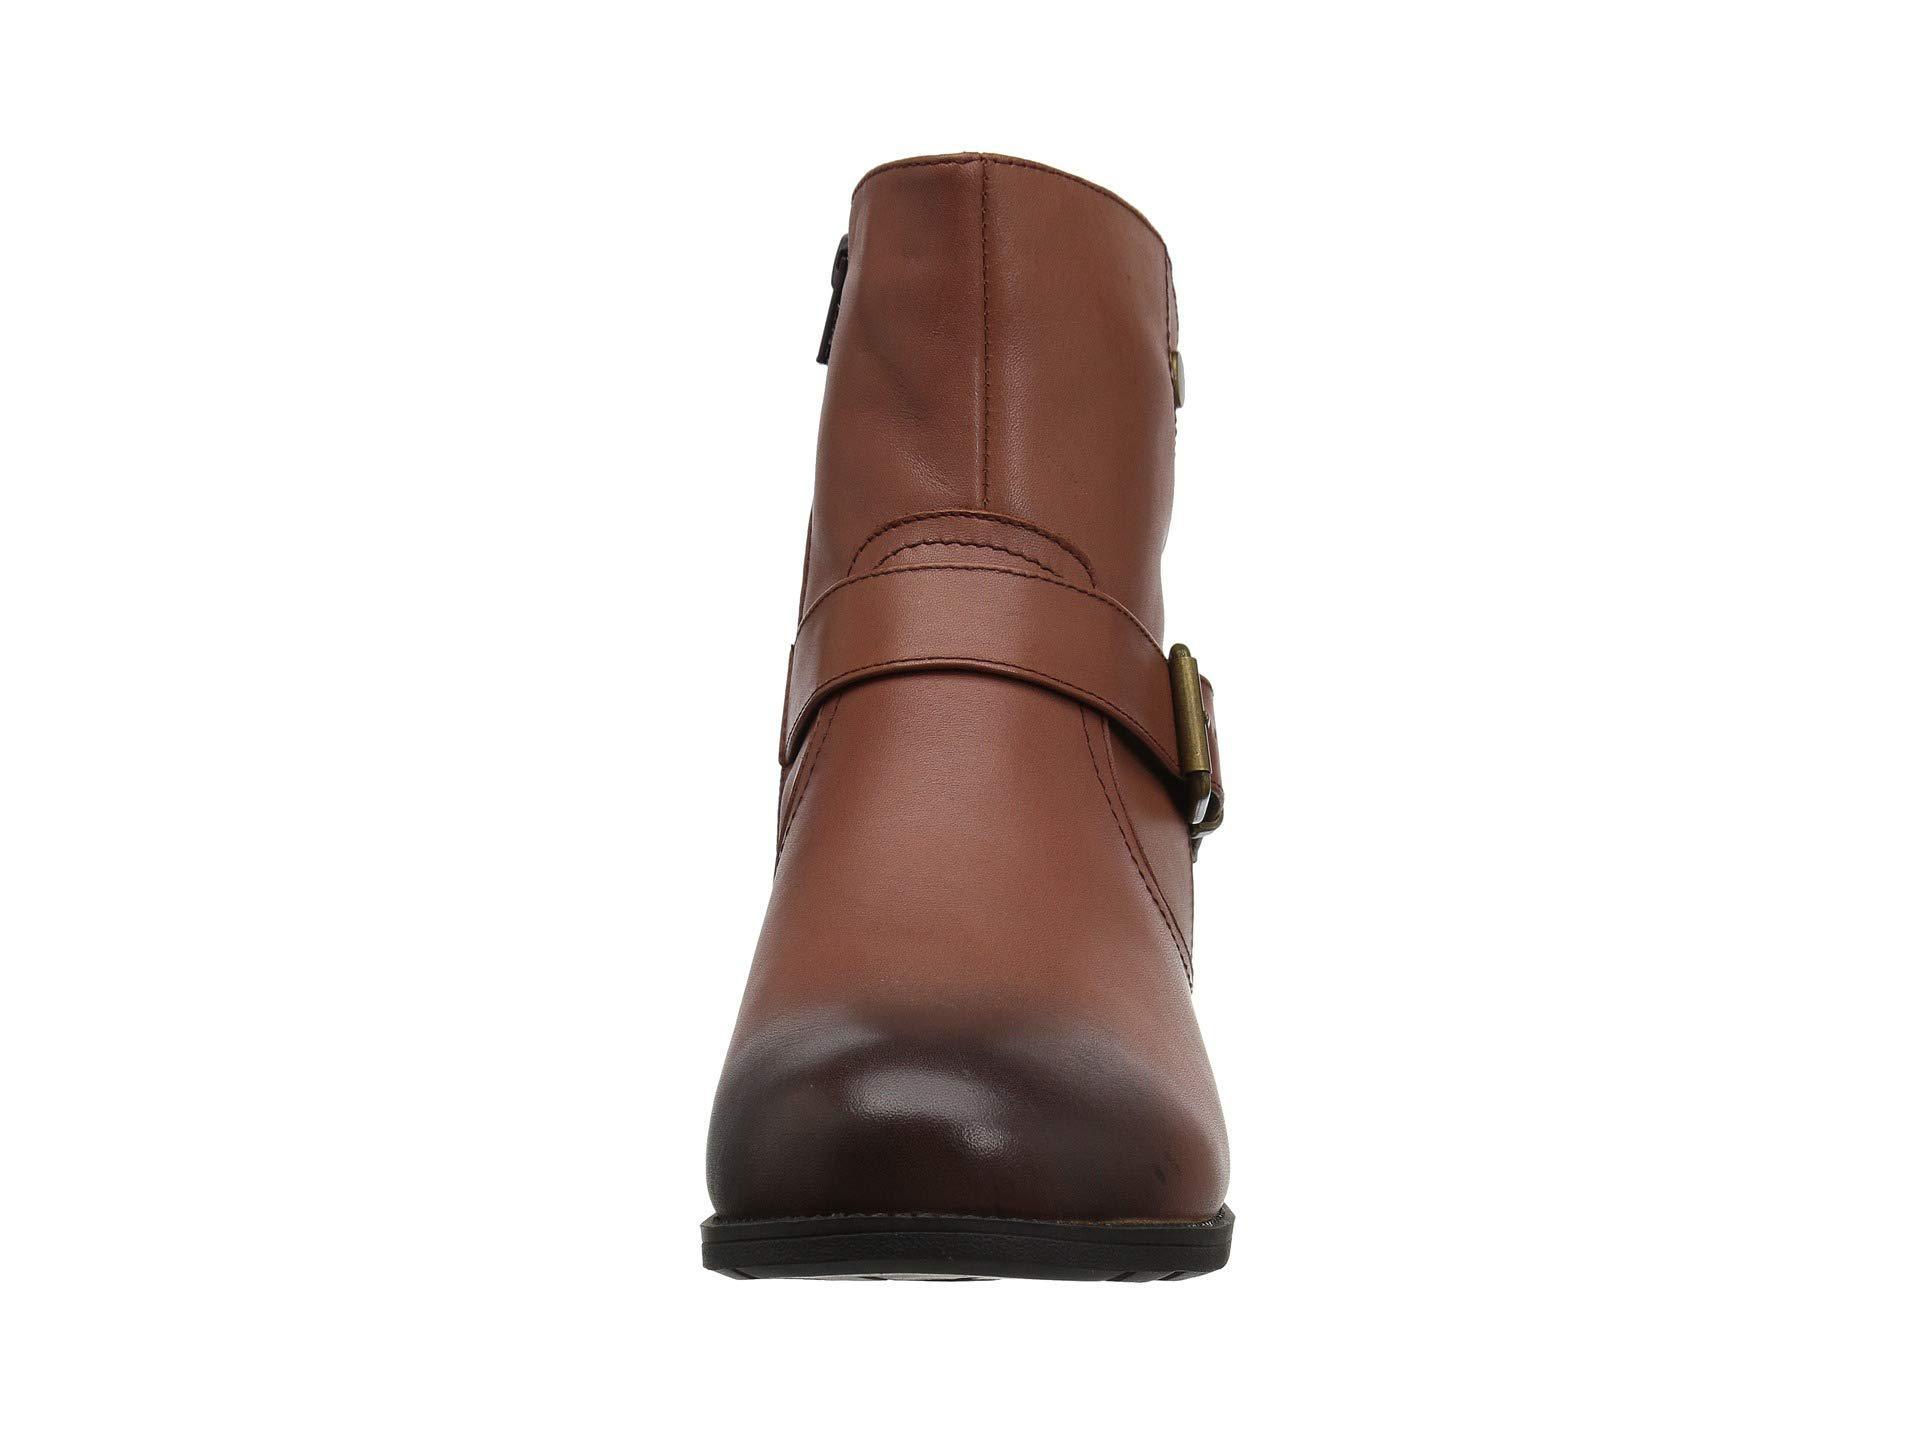 c87495d11c27 Propet - Brown Tory (black) Women s Shoes - Lyst. View fullscreen